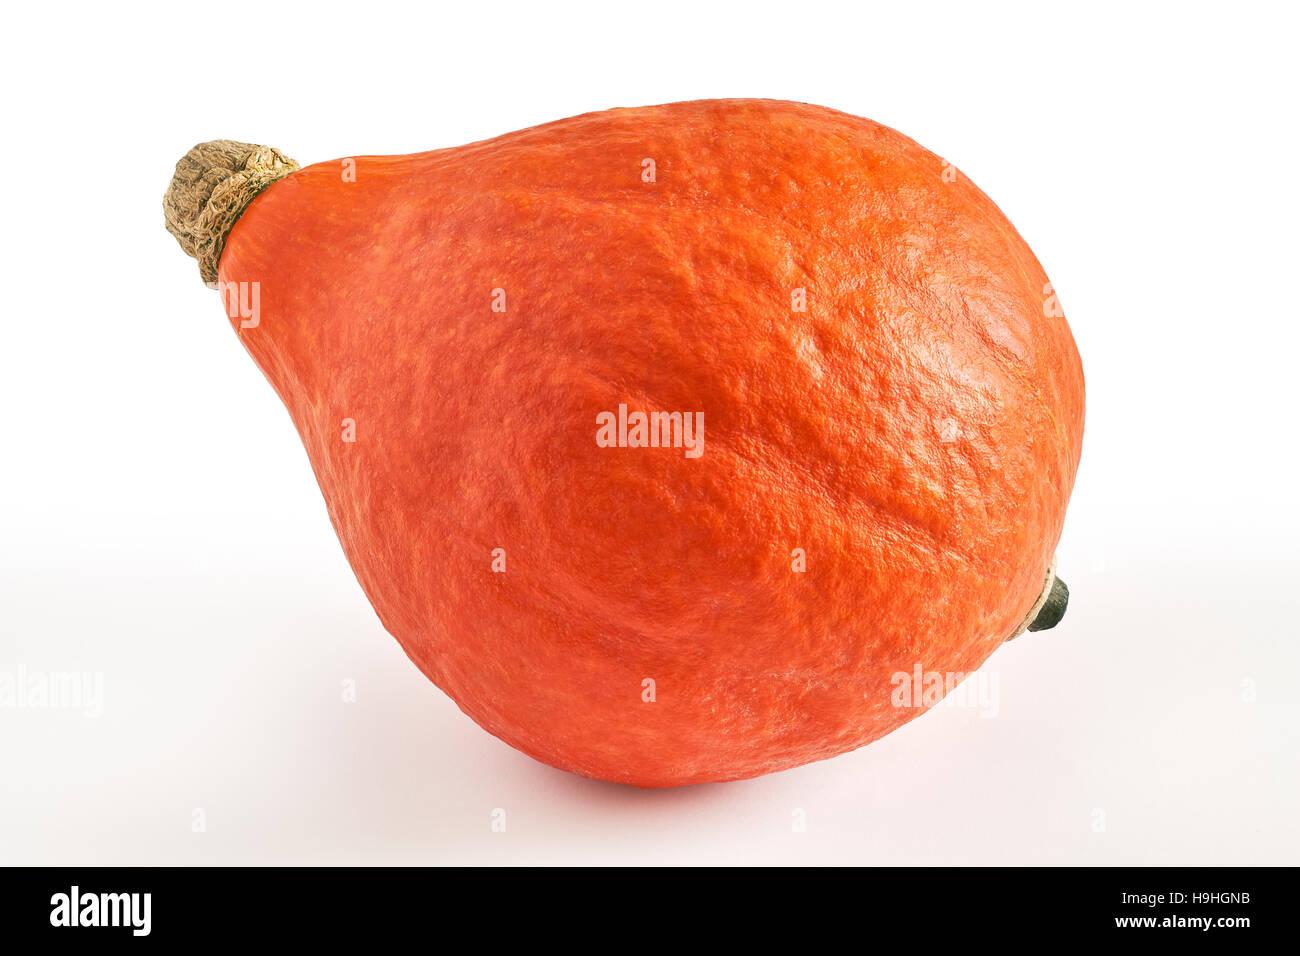 Red kuri squash (Hokkaido pumpkin) isolated on white background Stock Photo